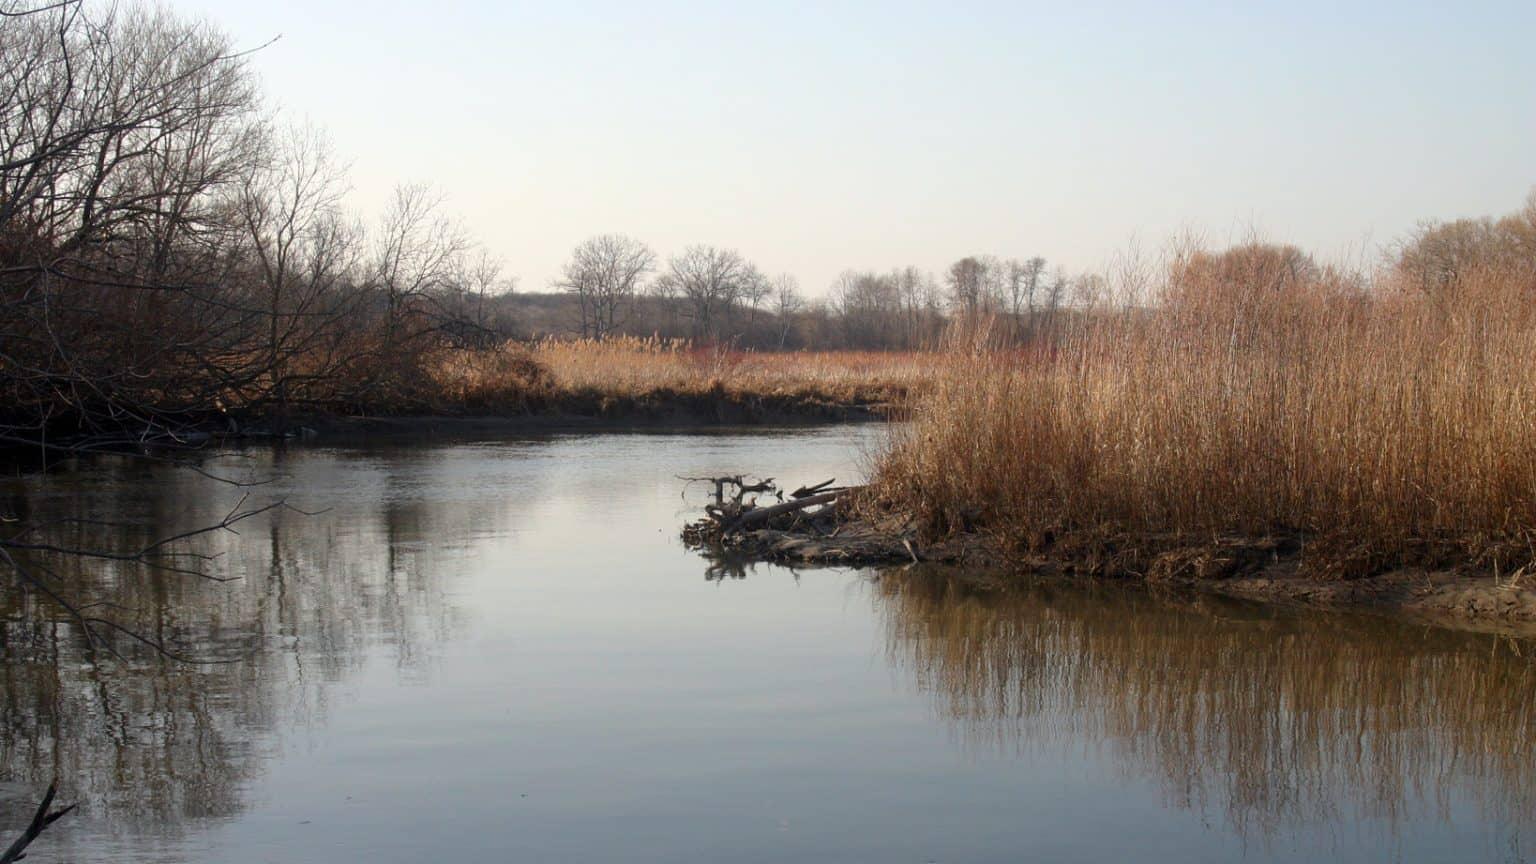 Duffin's Creek